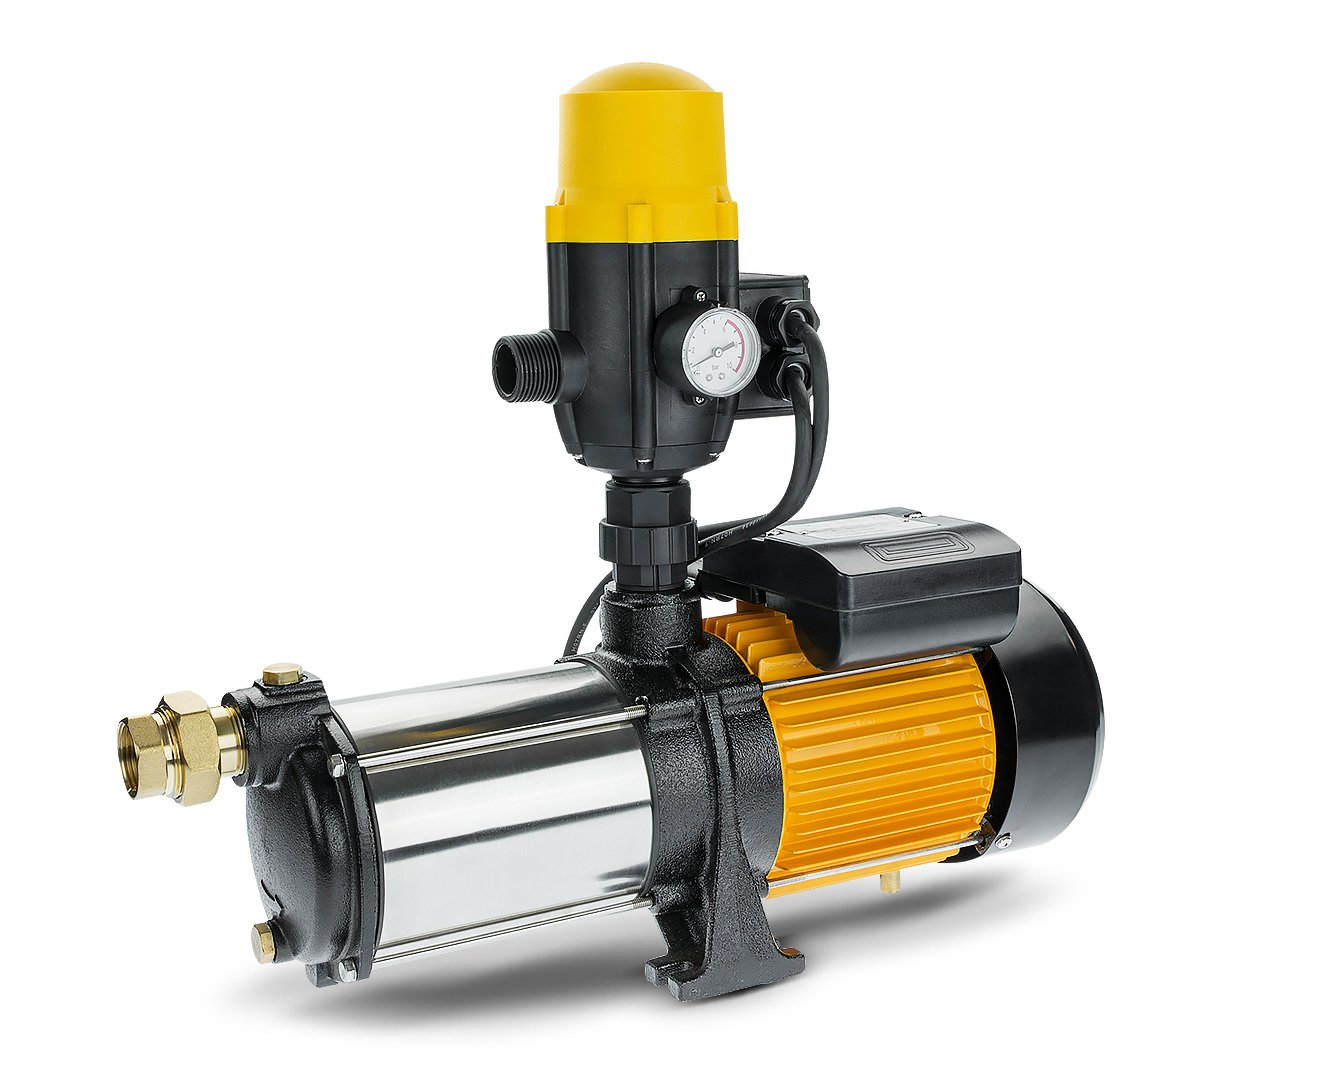 Hydro Active 5 Stage High Pressure Auto Water Pump - 1800W - $357.1